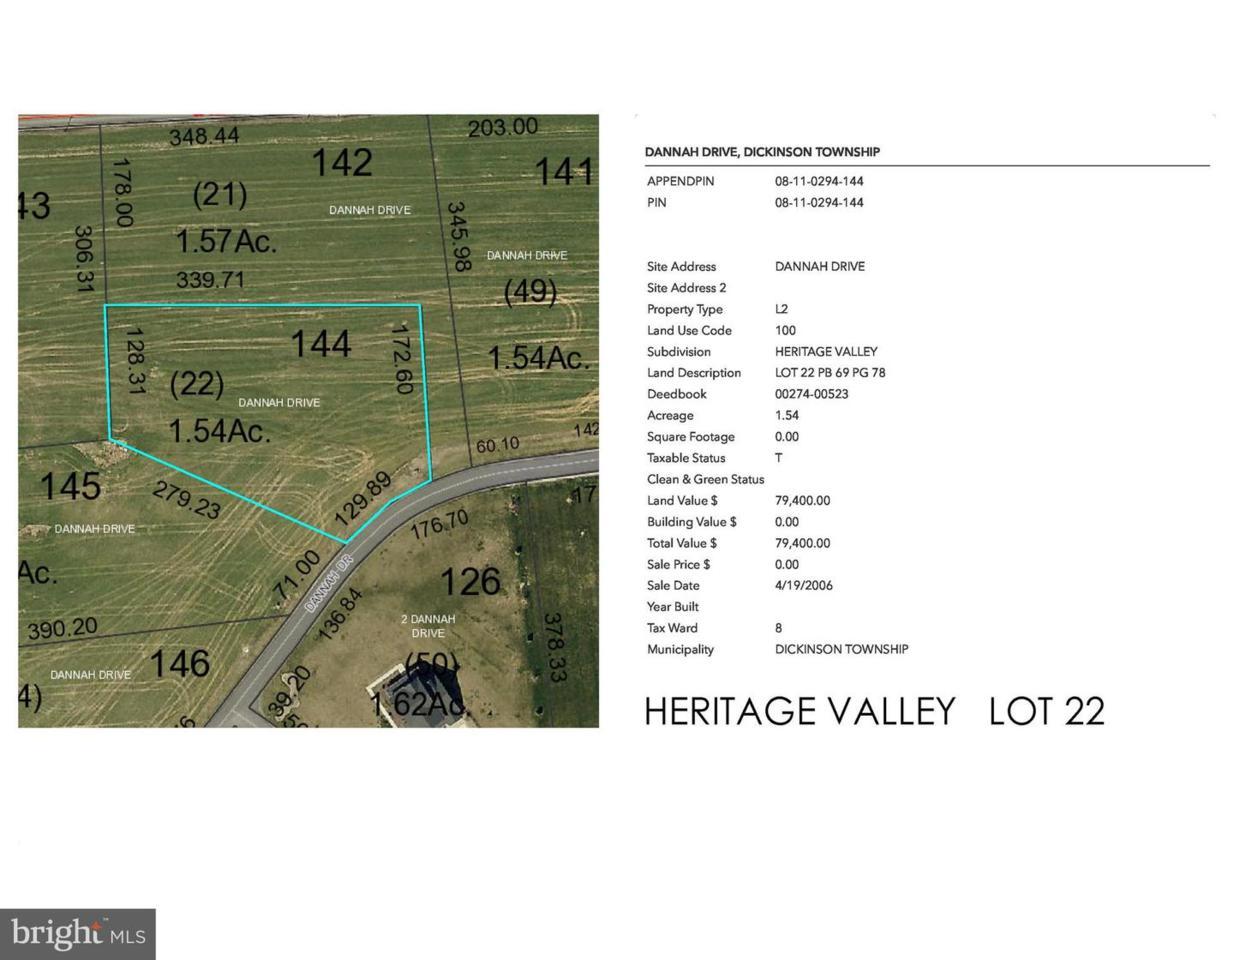 Heritage Valley - Dannah Drive - Photo 1